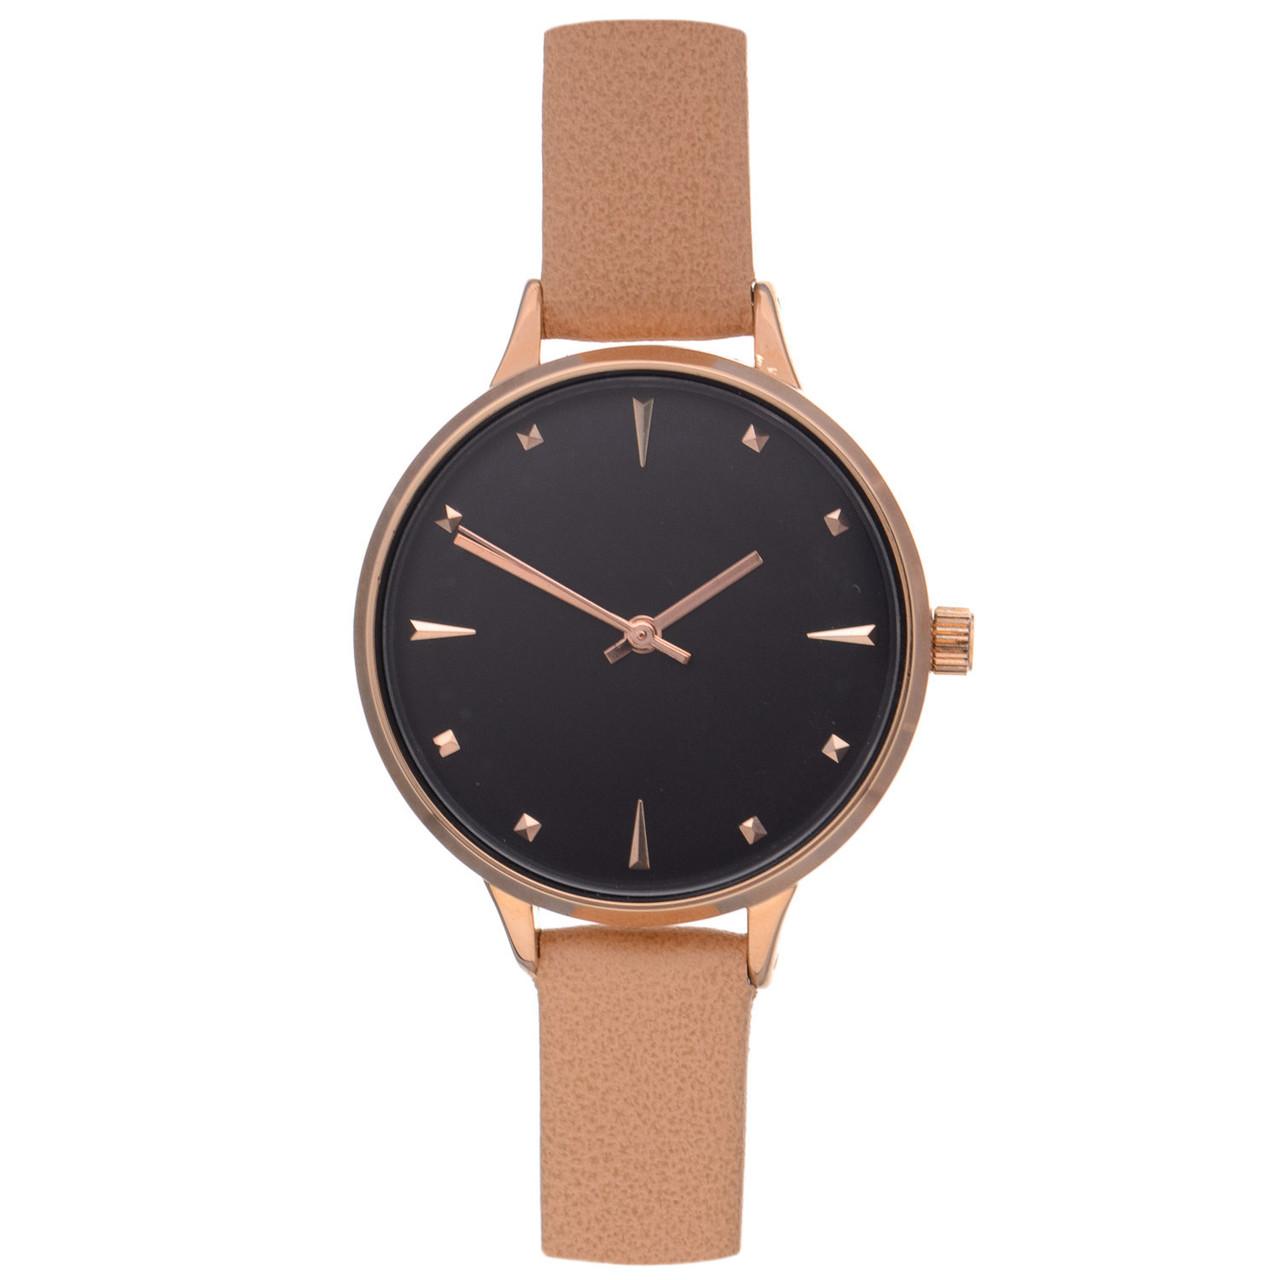 Жіночий годинник Even&Odd 17-0765 Brown